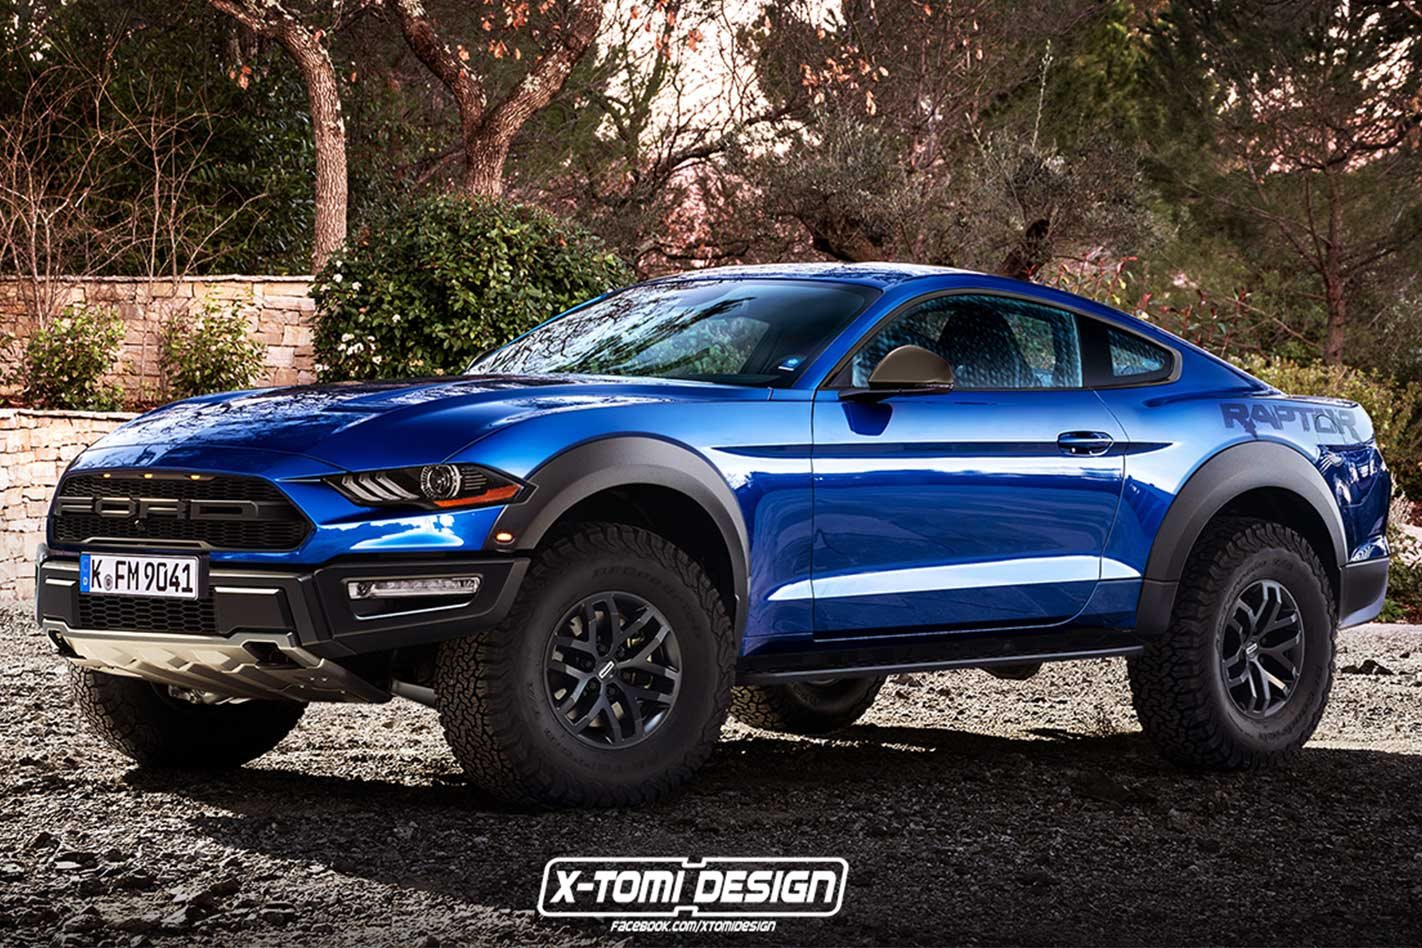 Ford Mustang Raptor Rendered